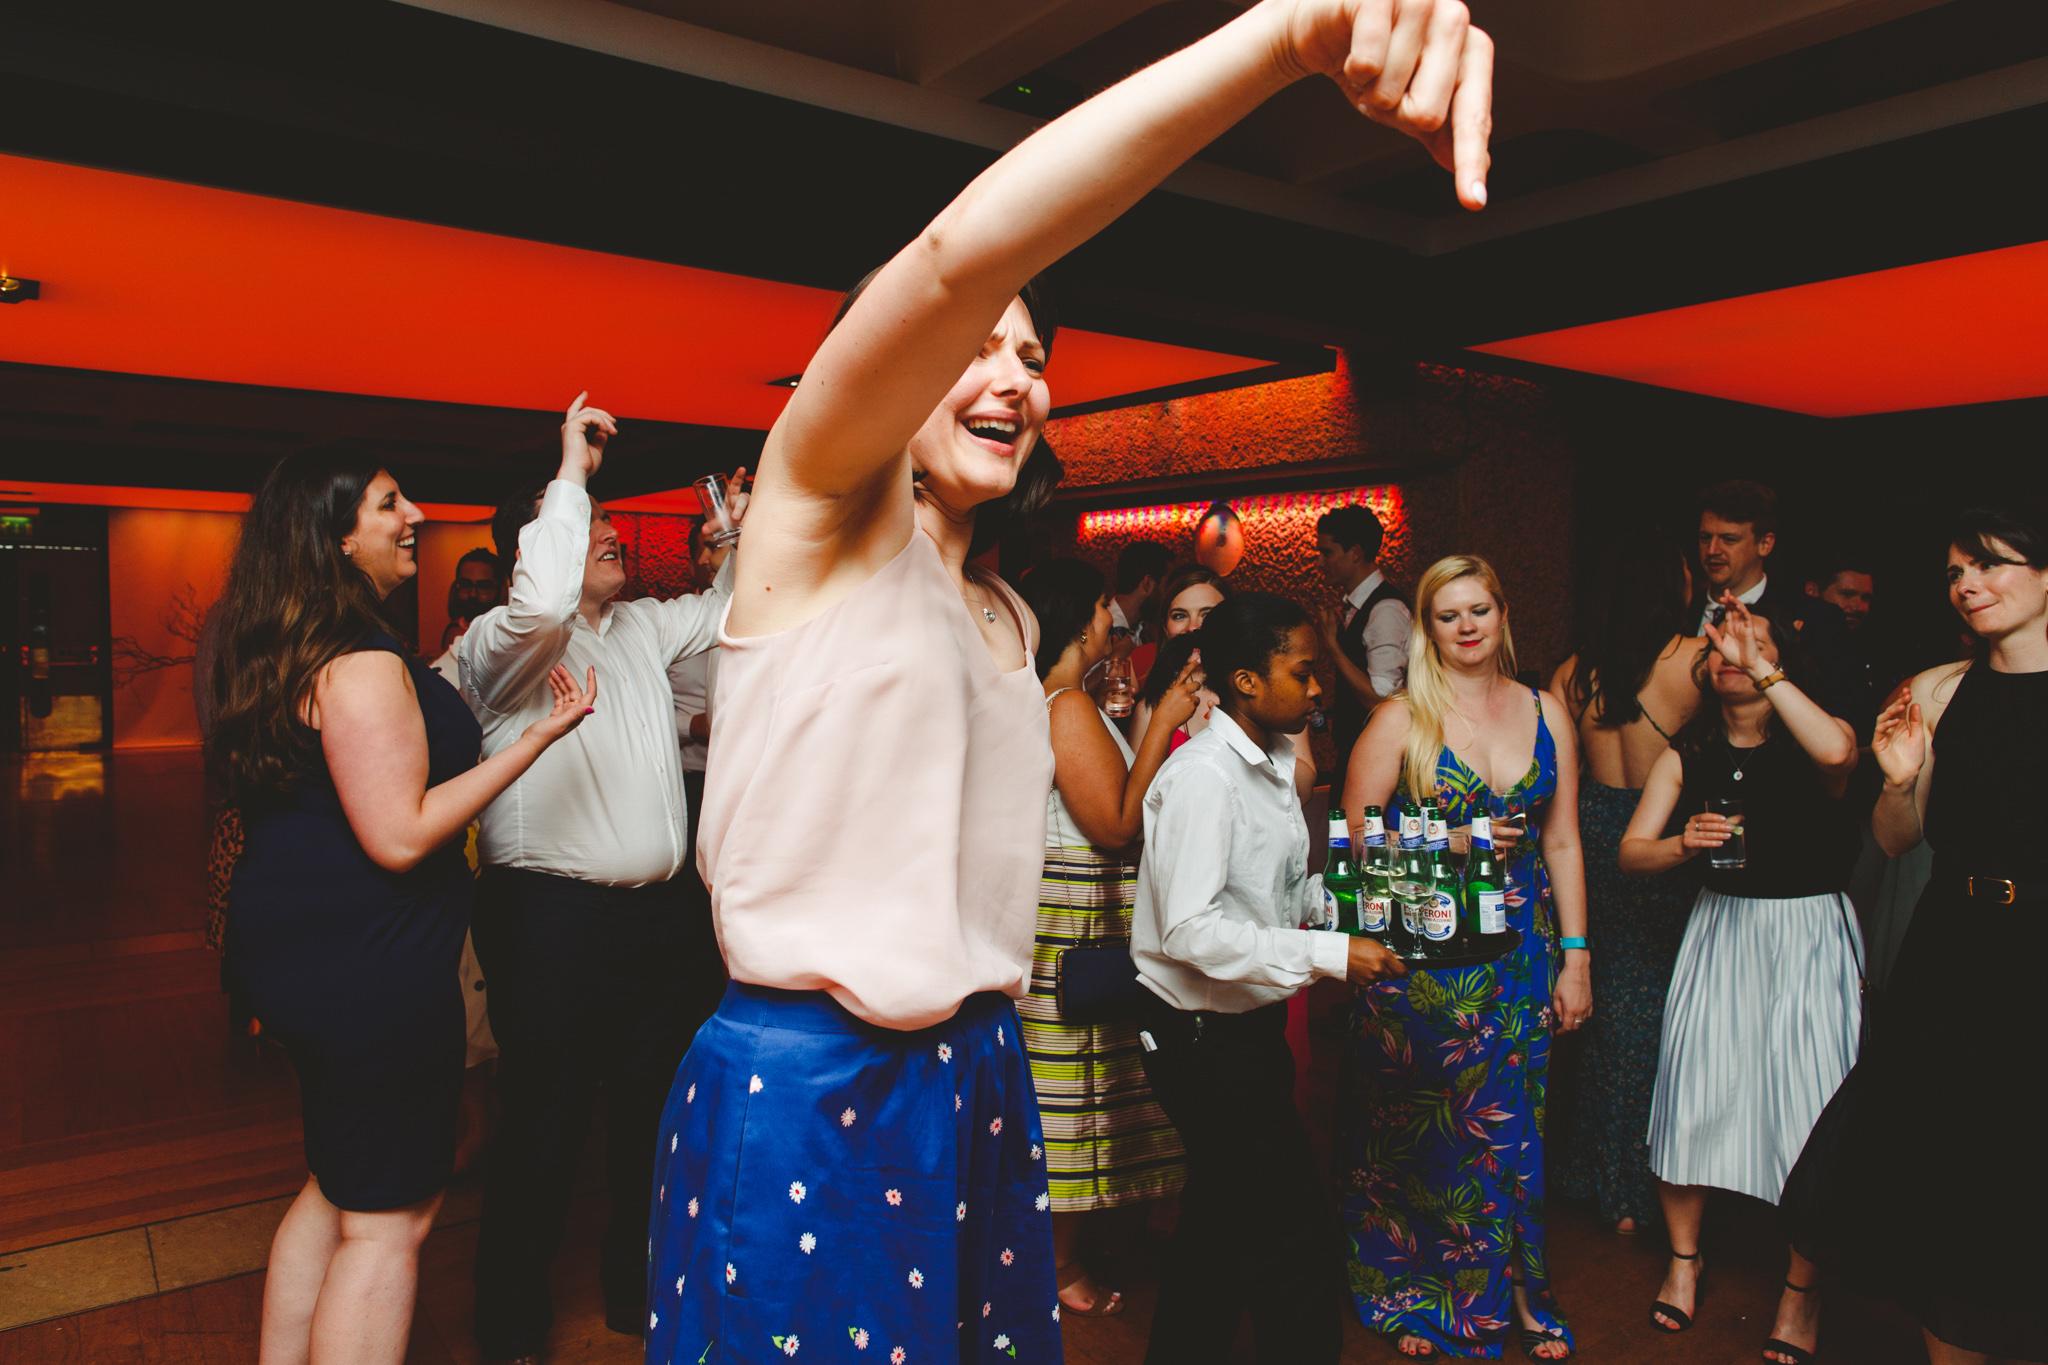 derbyshire-wedding-photographer-videographer-camera-hannah-82.jpg